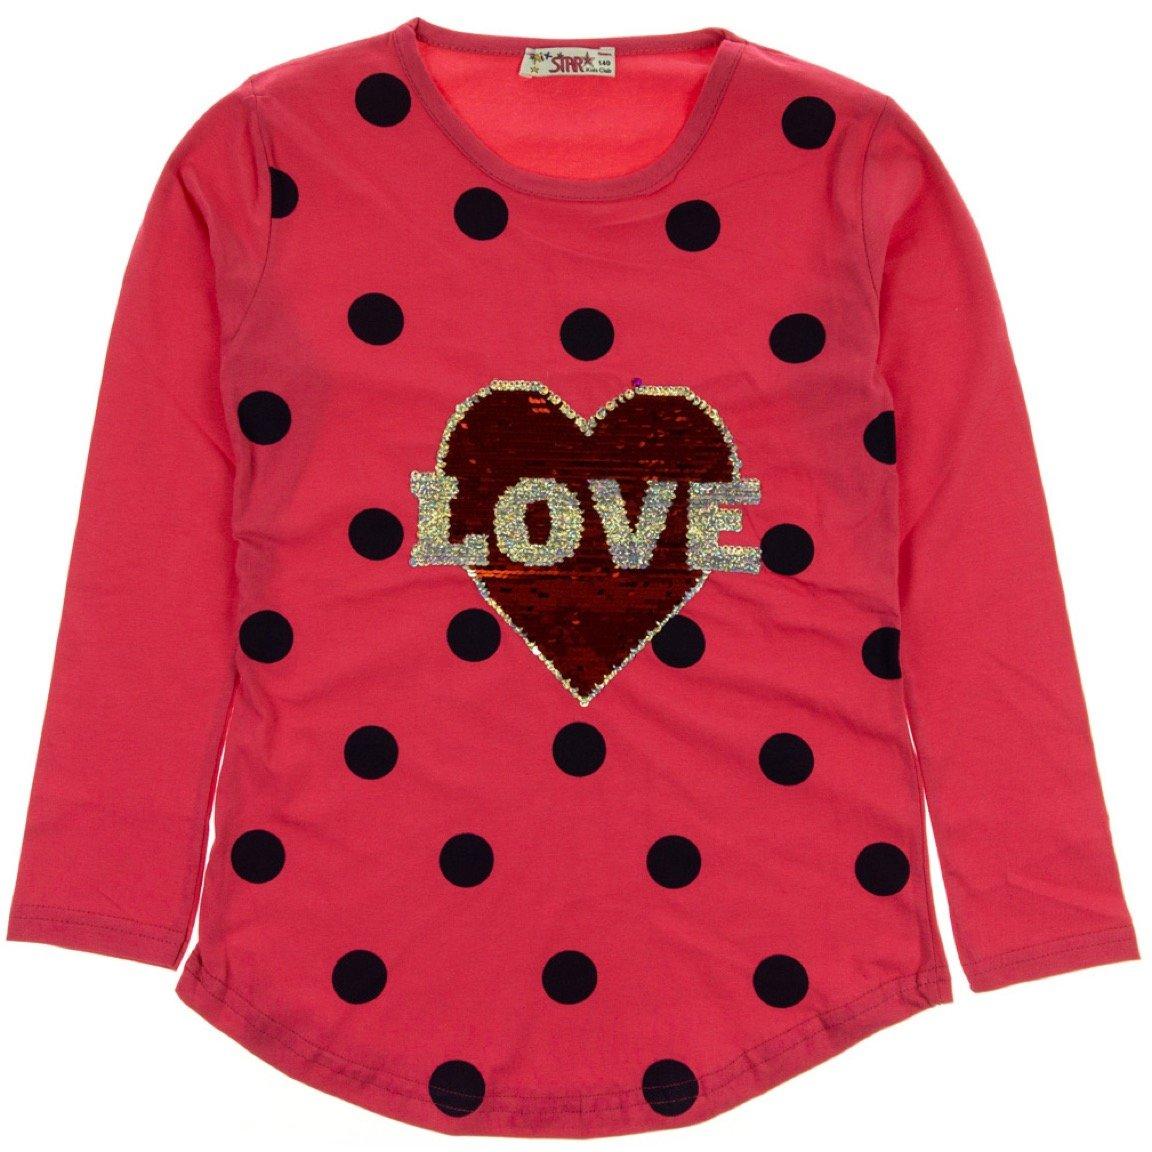 Tomurcuk παιδική εποχιακή μπλούζα «Love in the Heart»